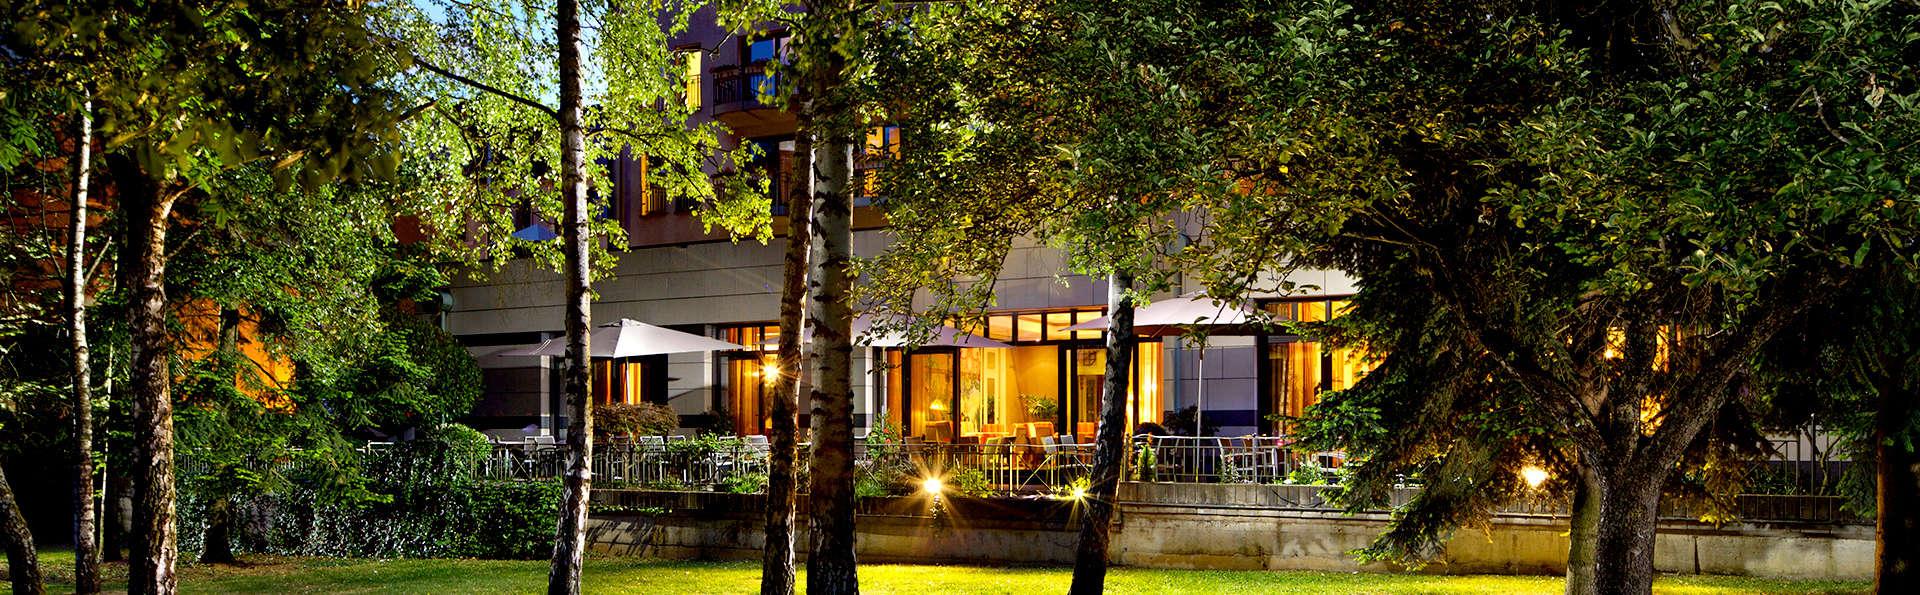 Hotel Parc Belair - EDIT_NEW_FRONT.jpg